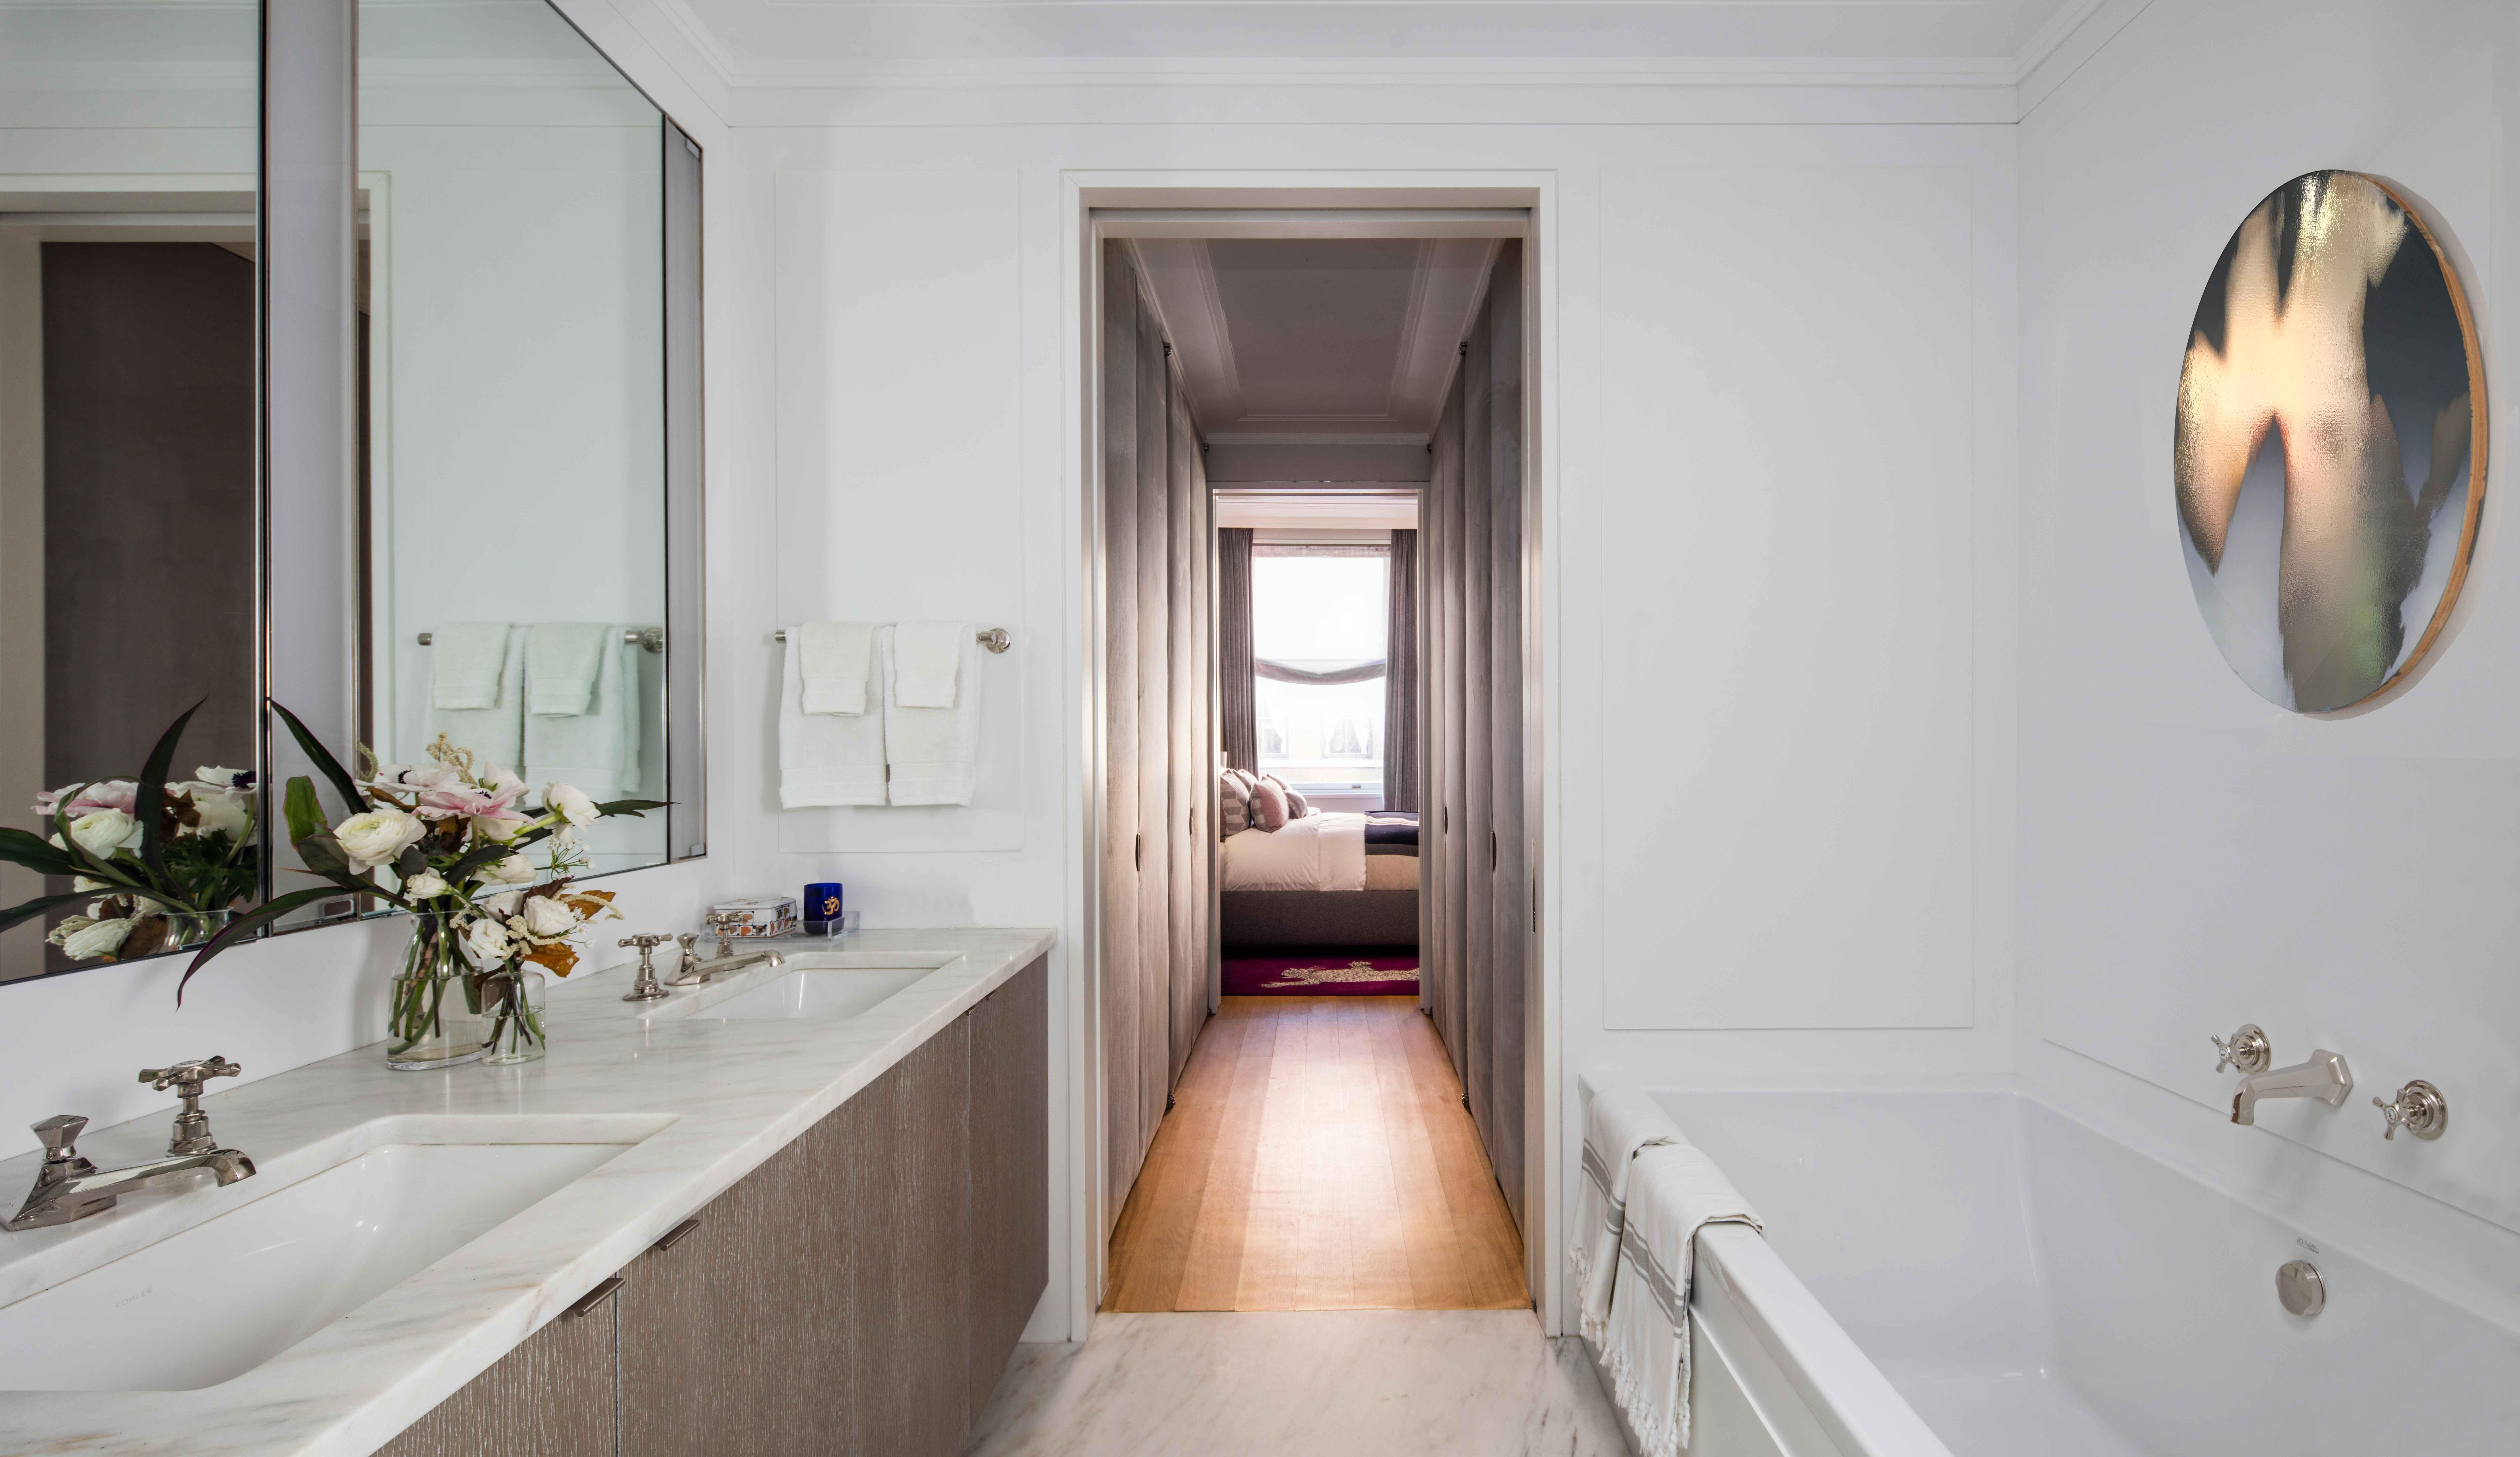 7-harrison-bathroom-nicole-fuller